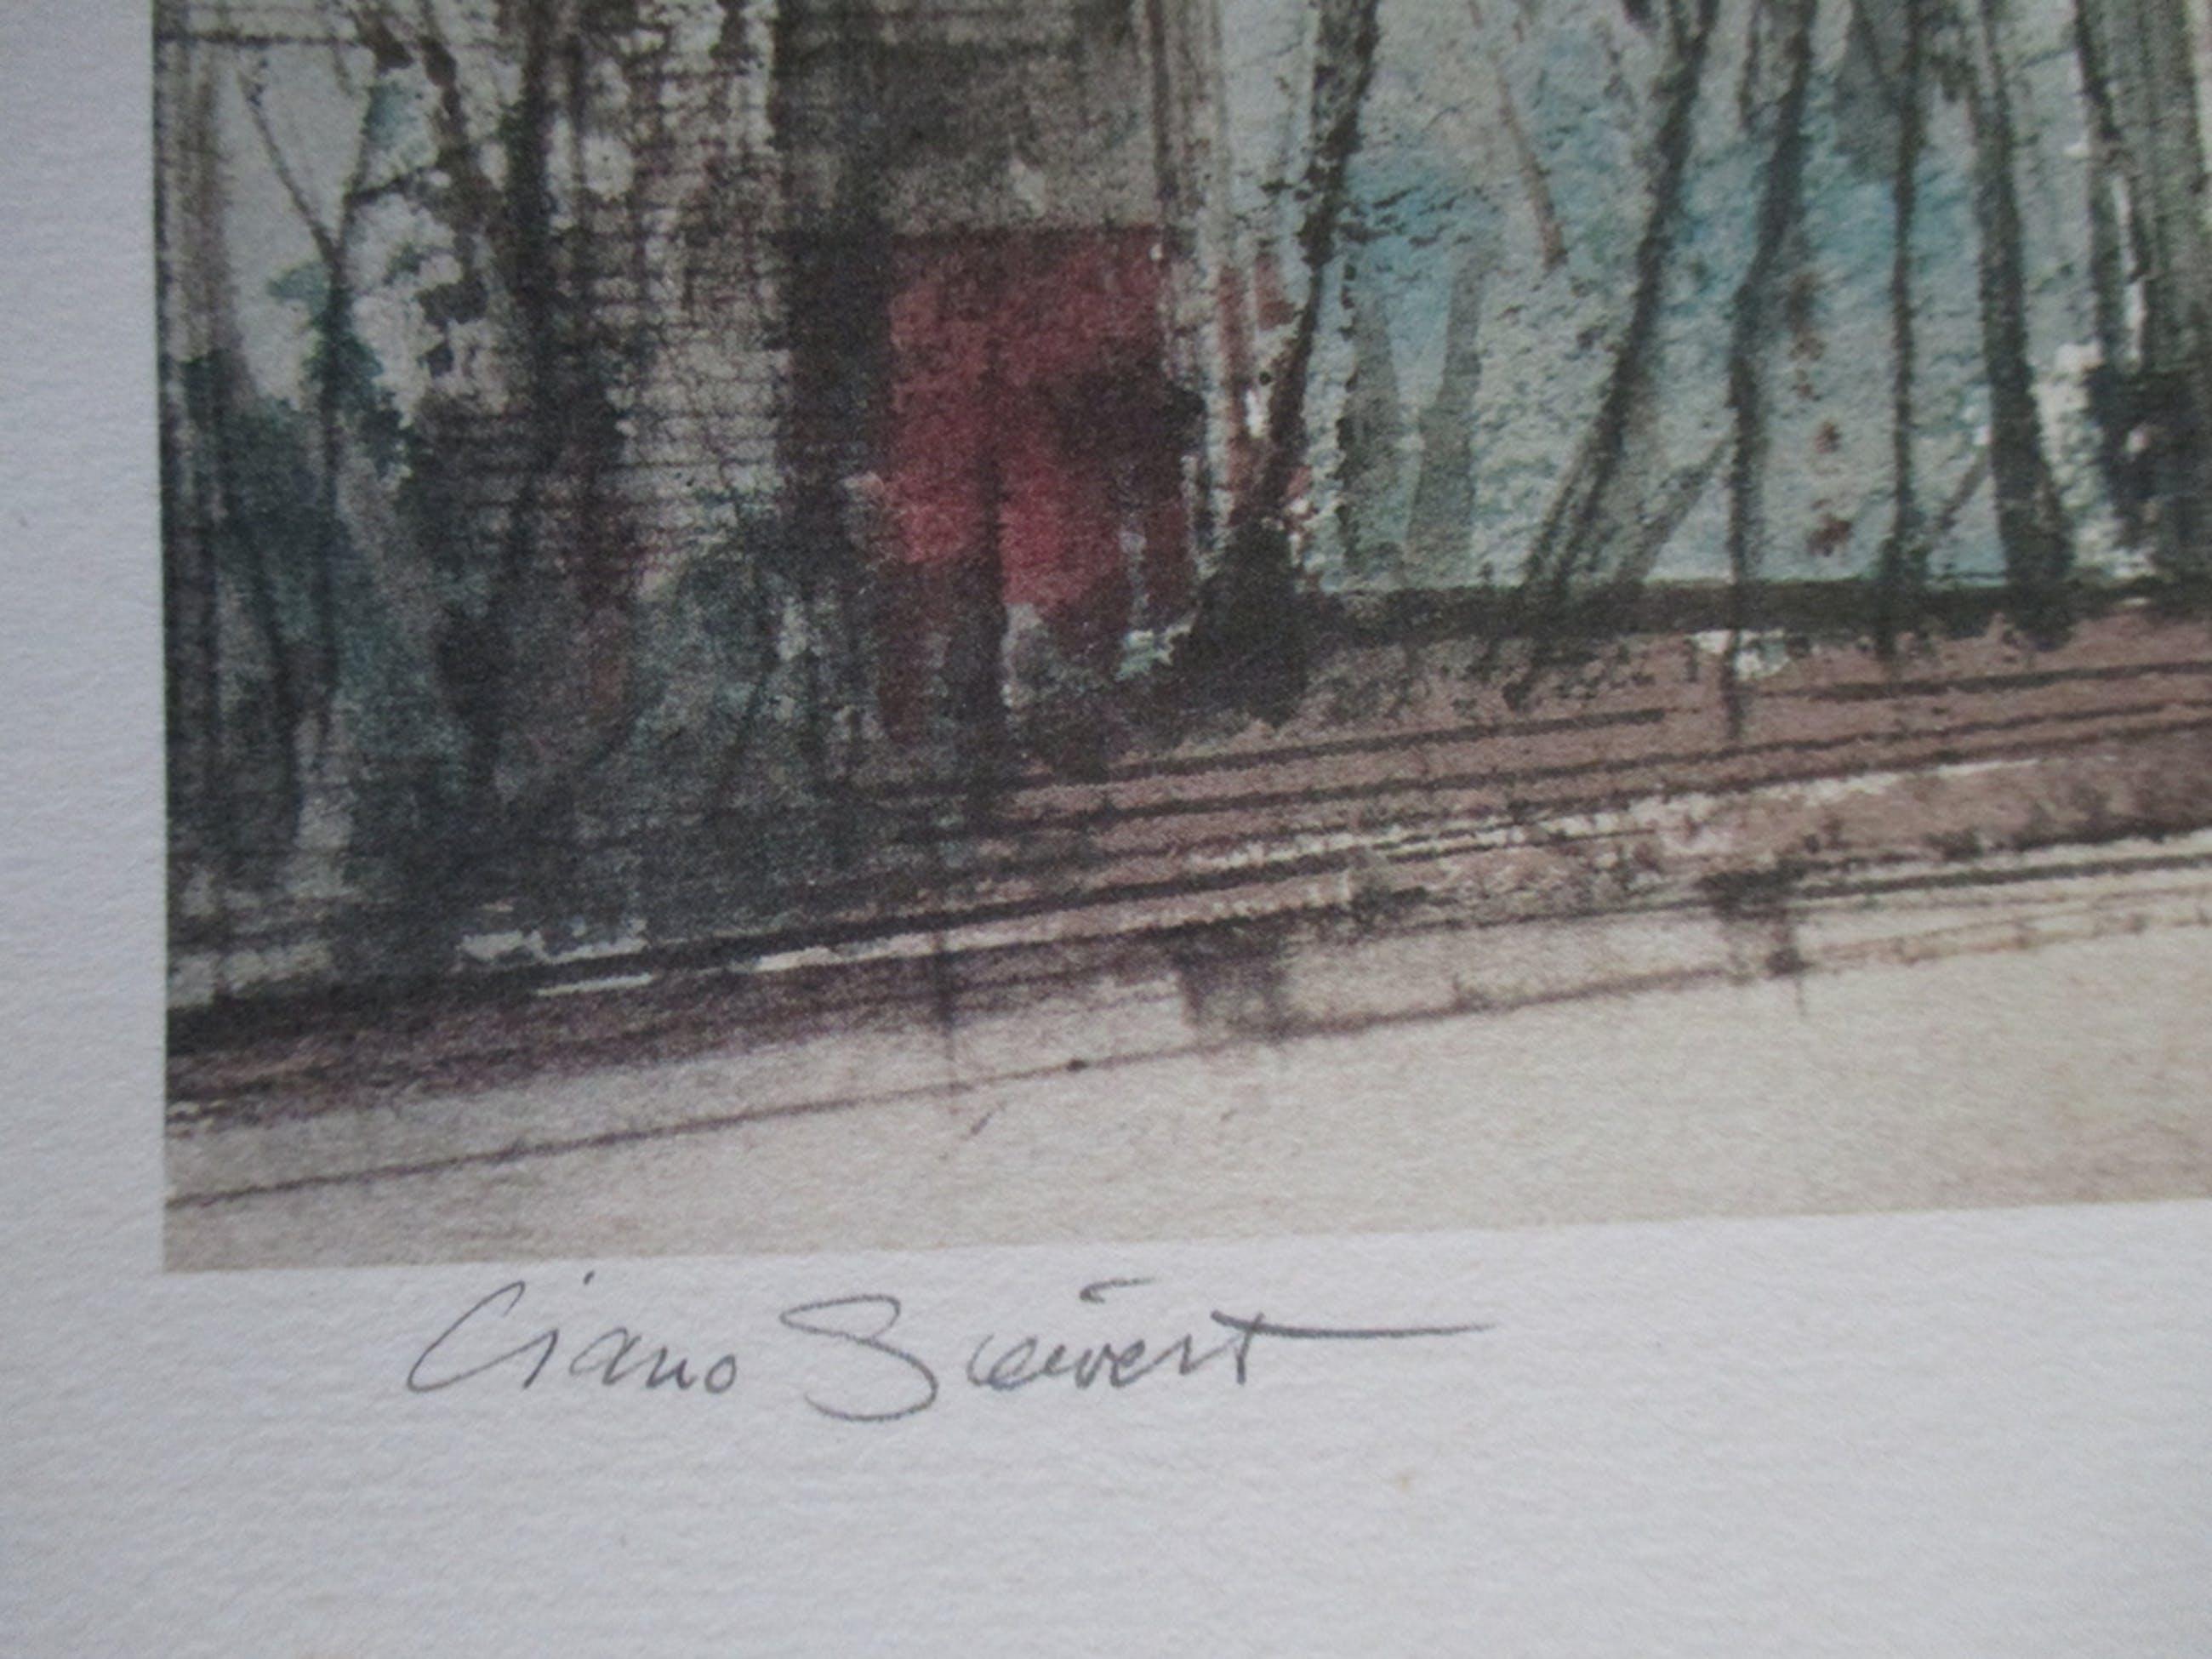 Ciano Siewert, kleurenlitho nr. 2/100 kopen? Bied vanaf 1!